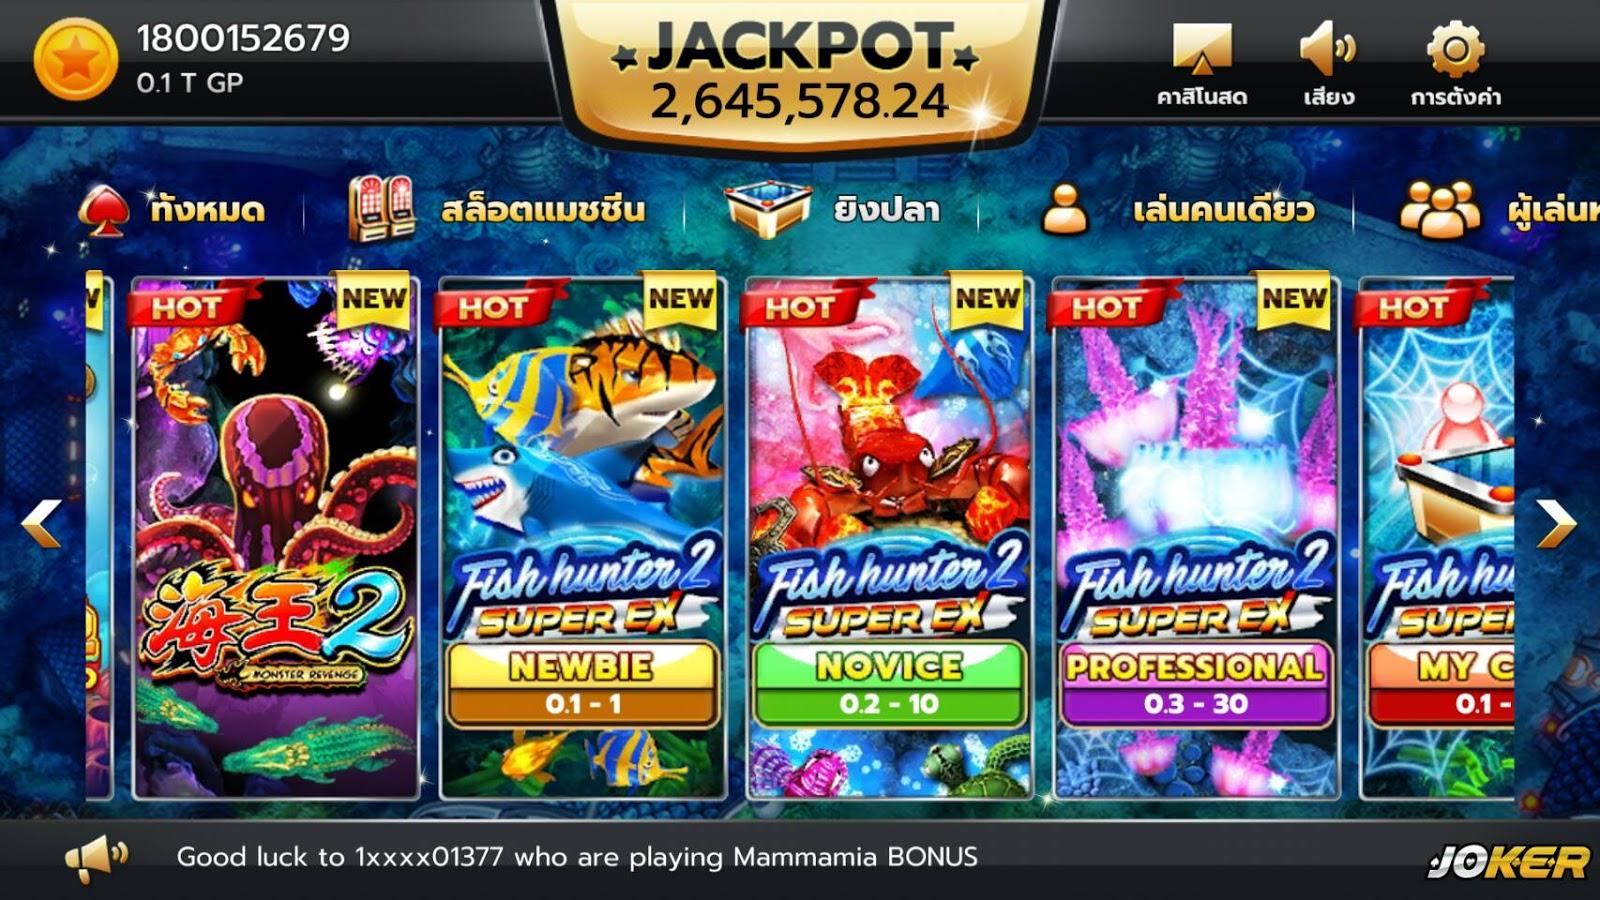 Http slotclub casino com bitcoin for online gambling